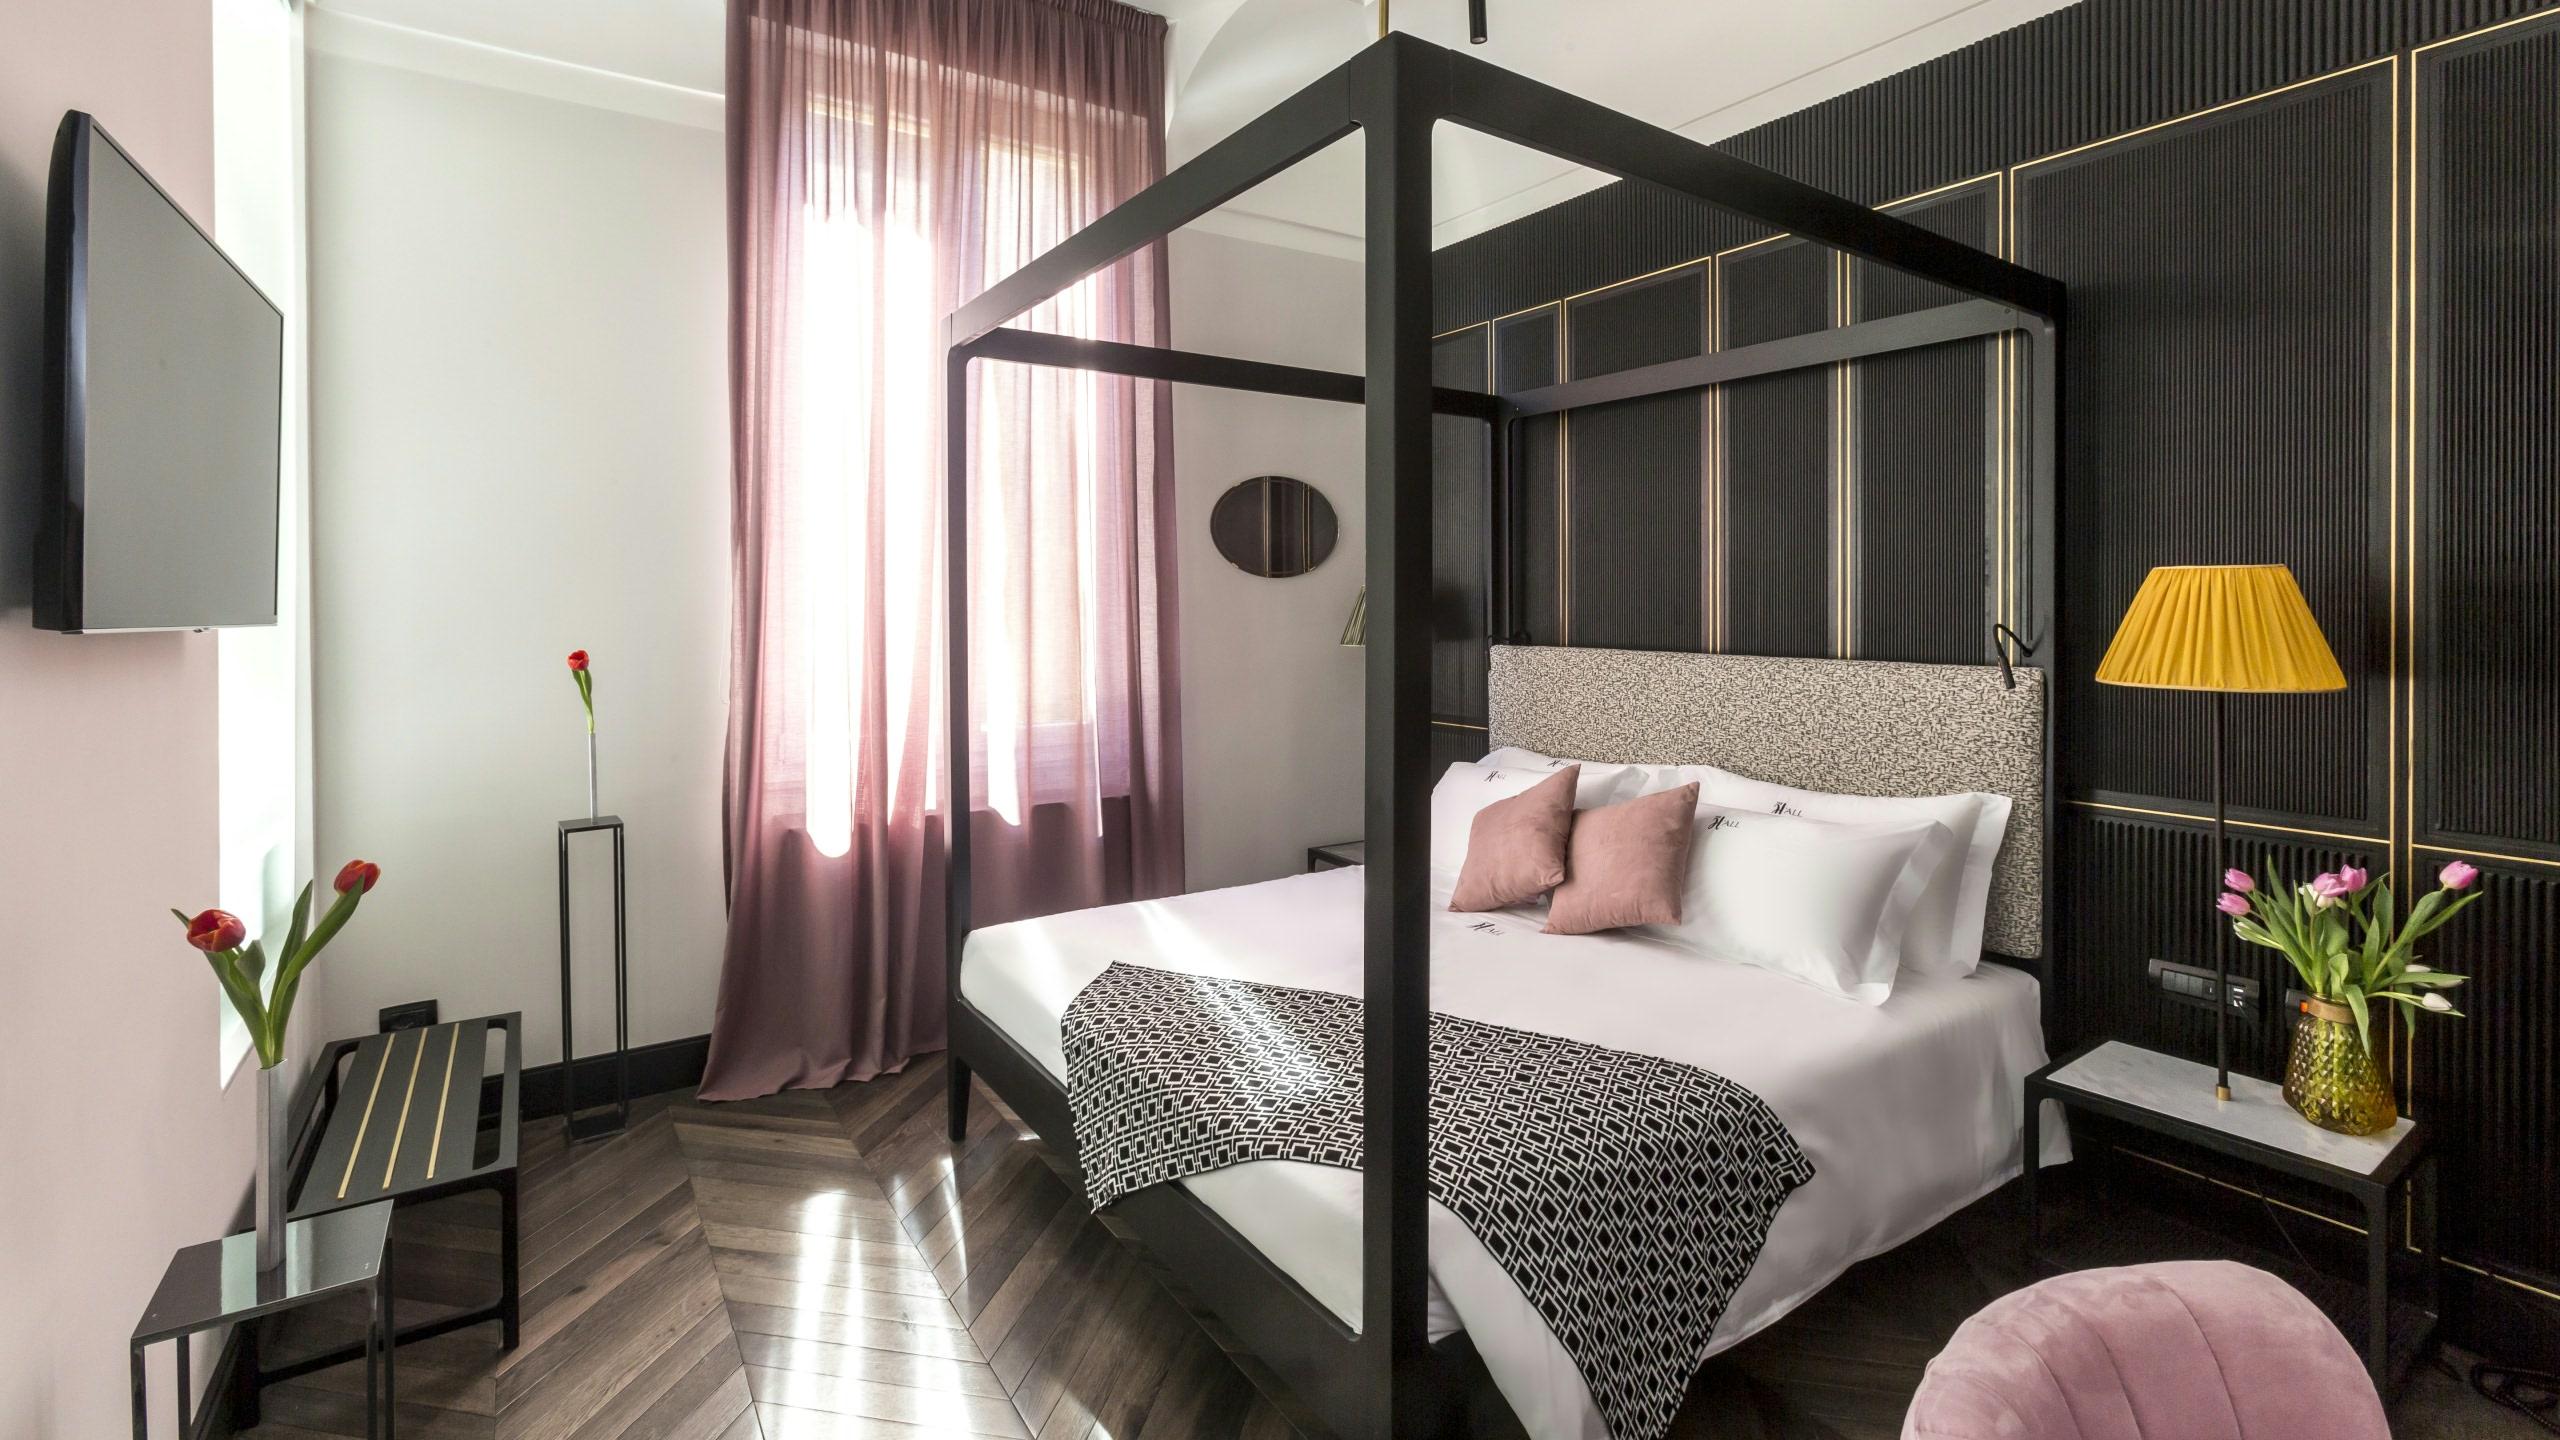 theallhotel-junior-0396